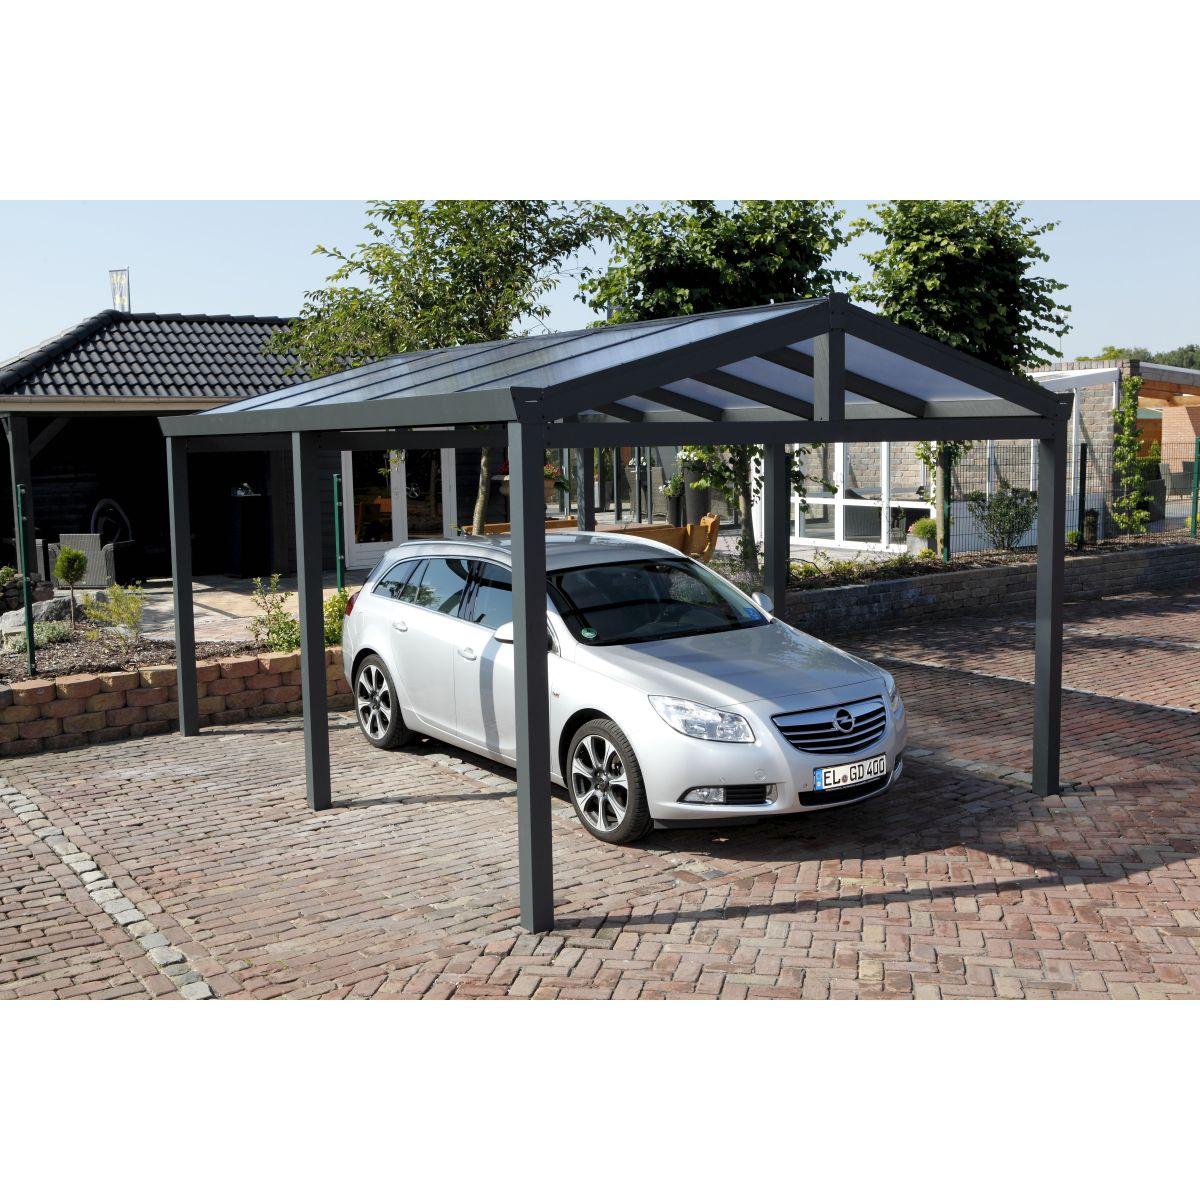 garden dreams abri voiture carport aluminium double pente anthracite 368x500